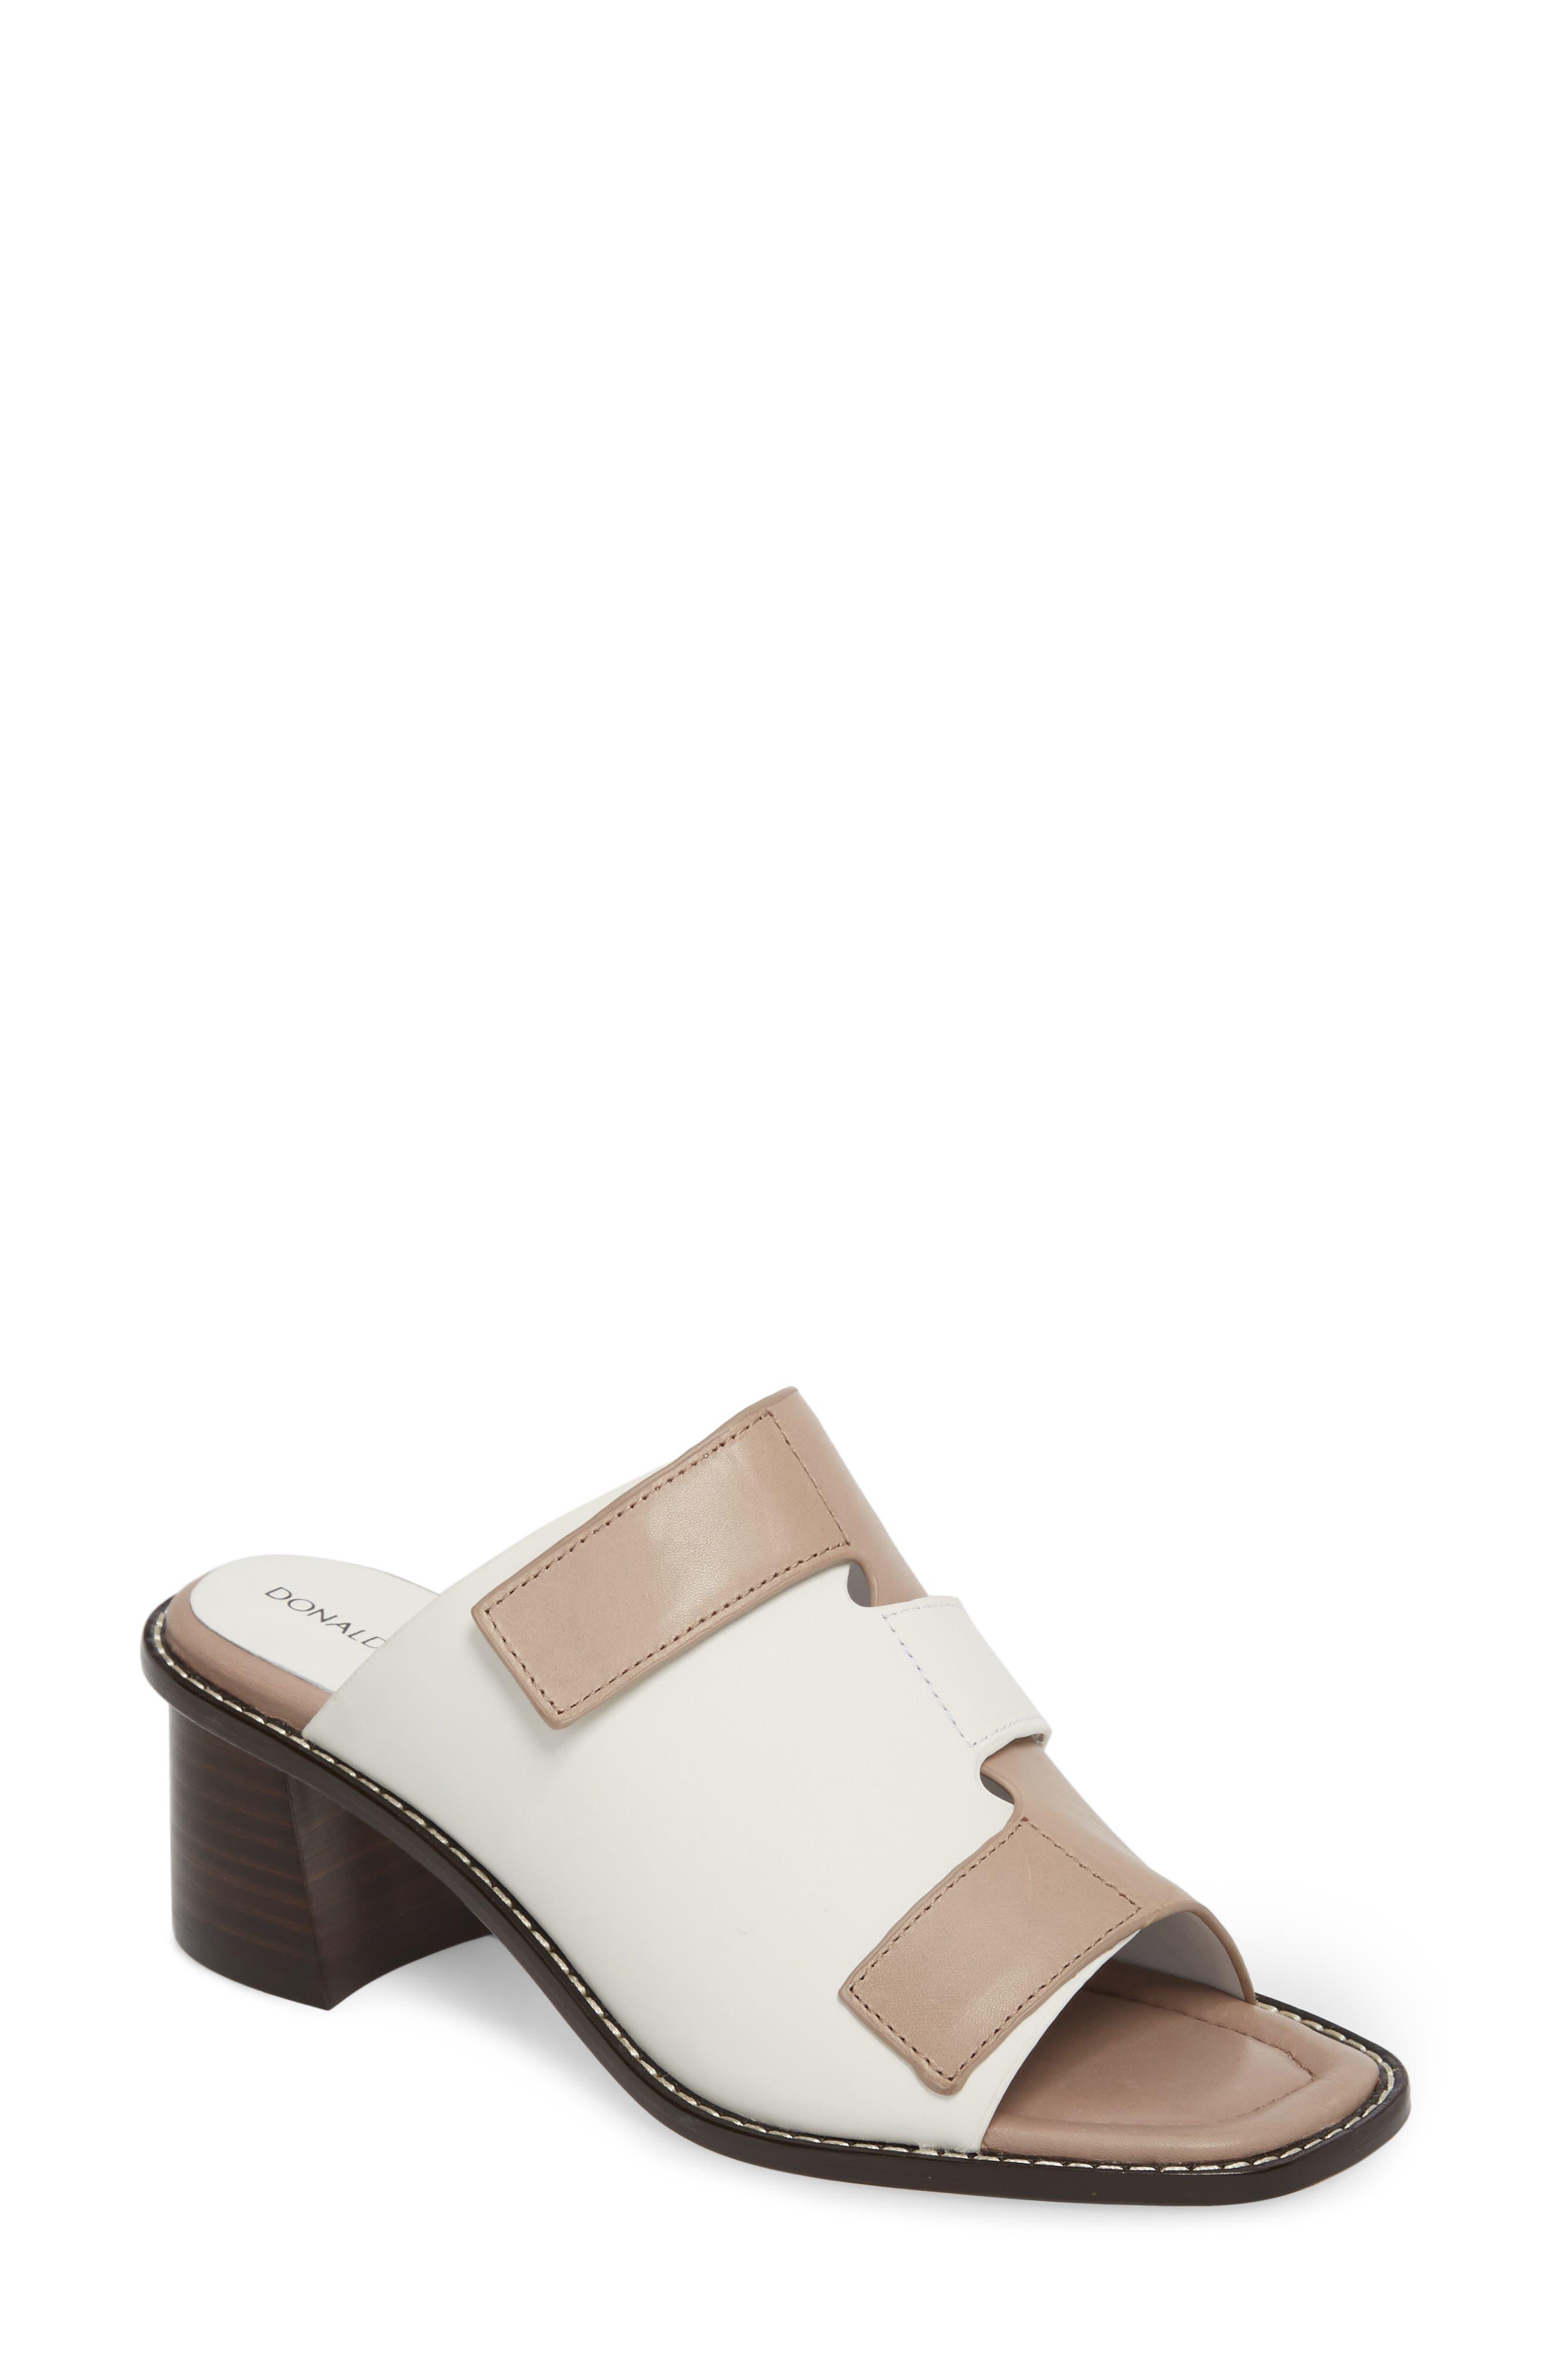 Amalia Block Heel Sandal,                             Main thumbnail 1, color,                             Bone Leather